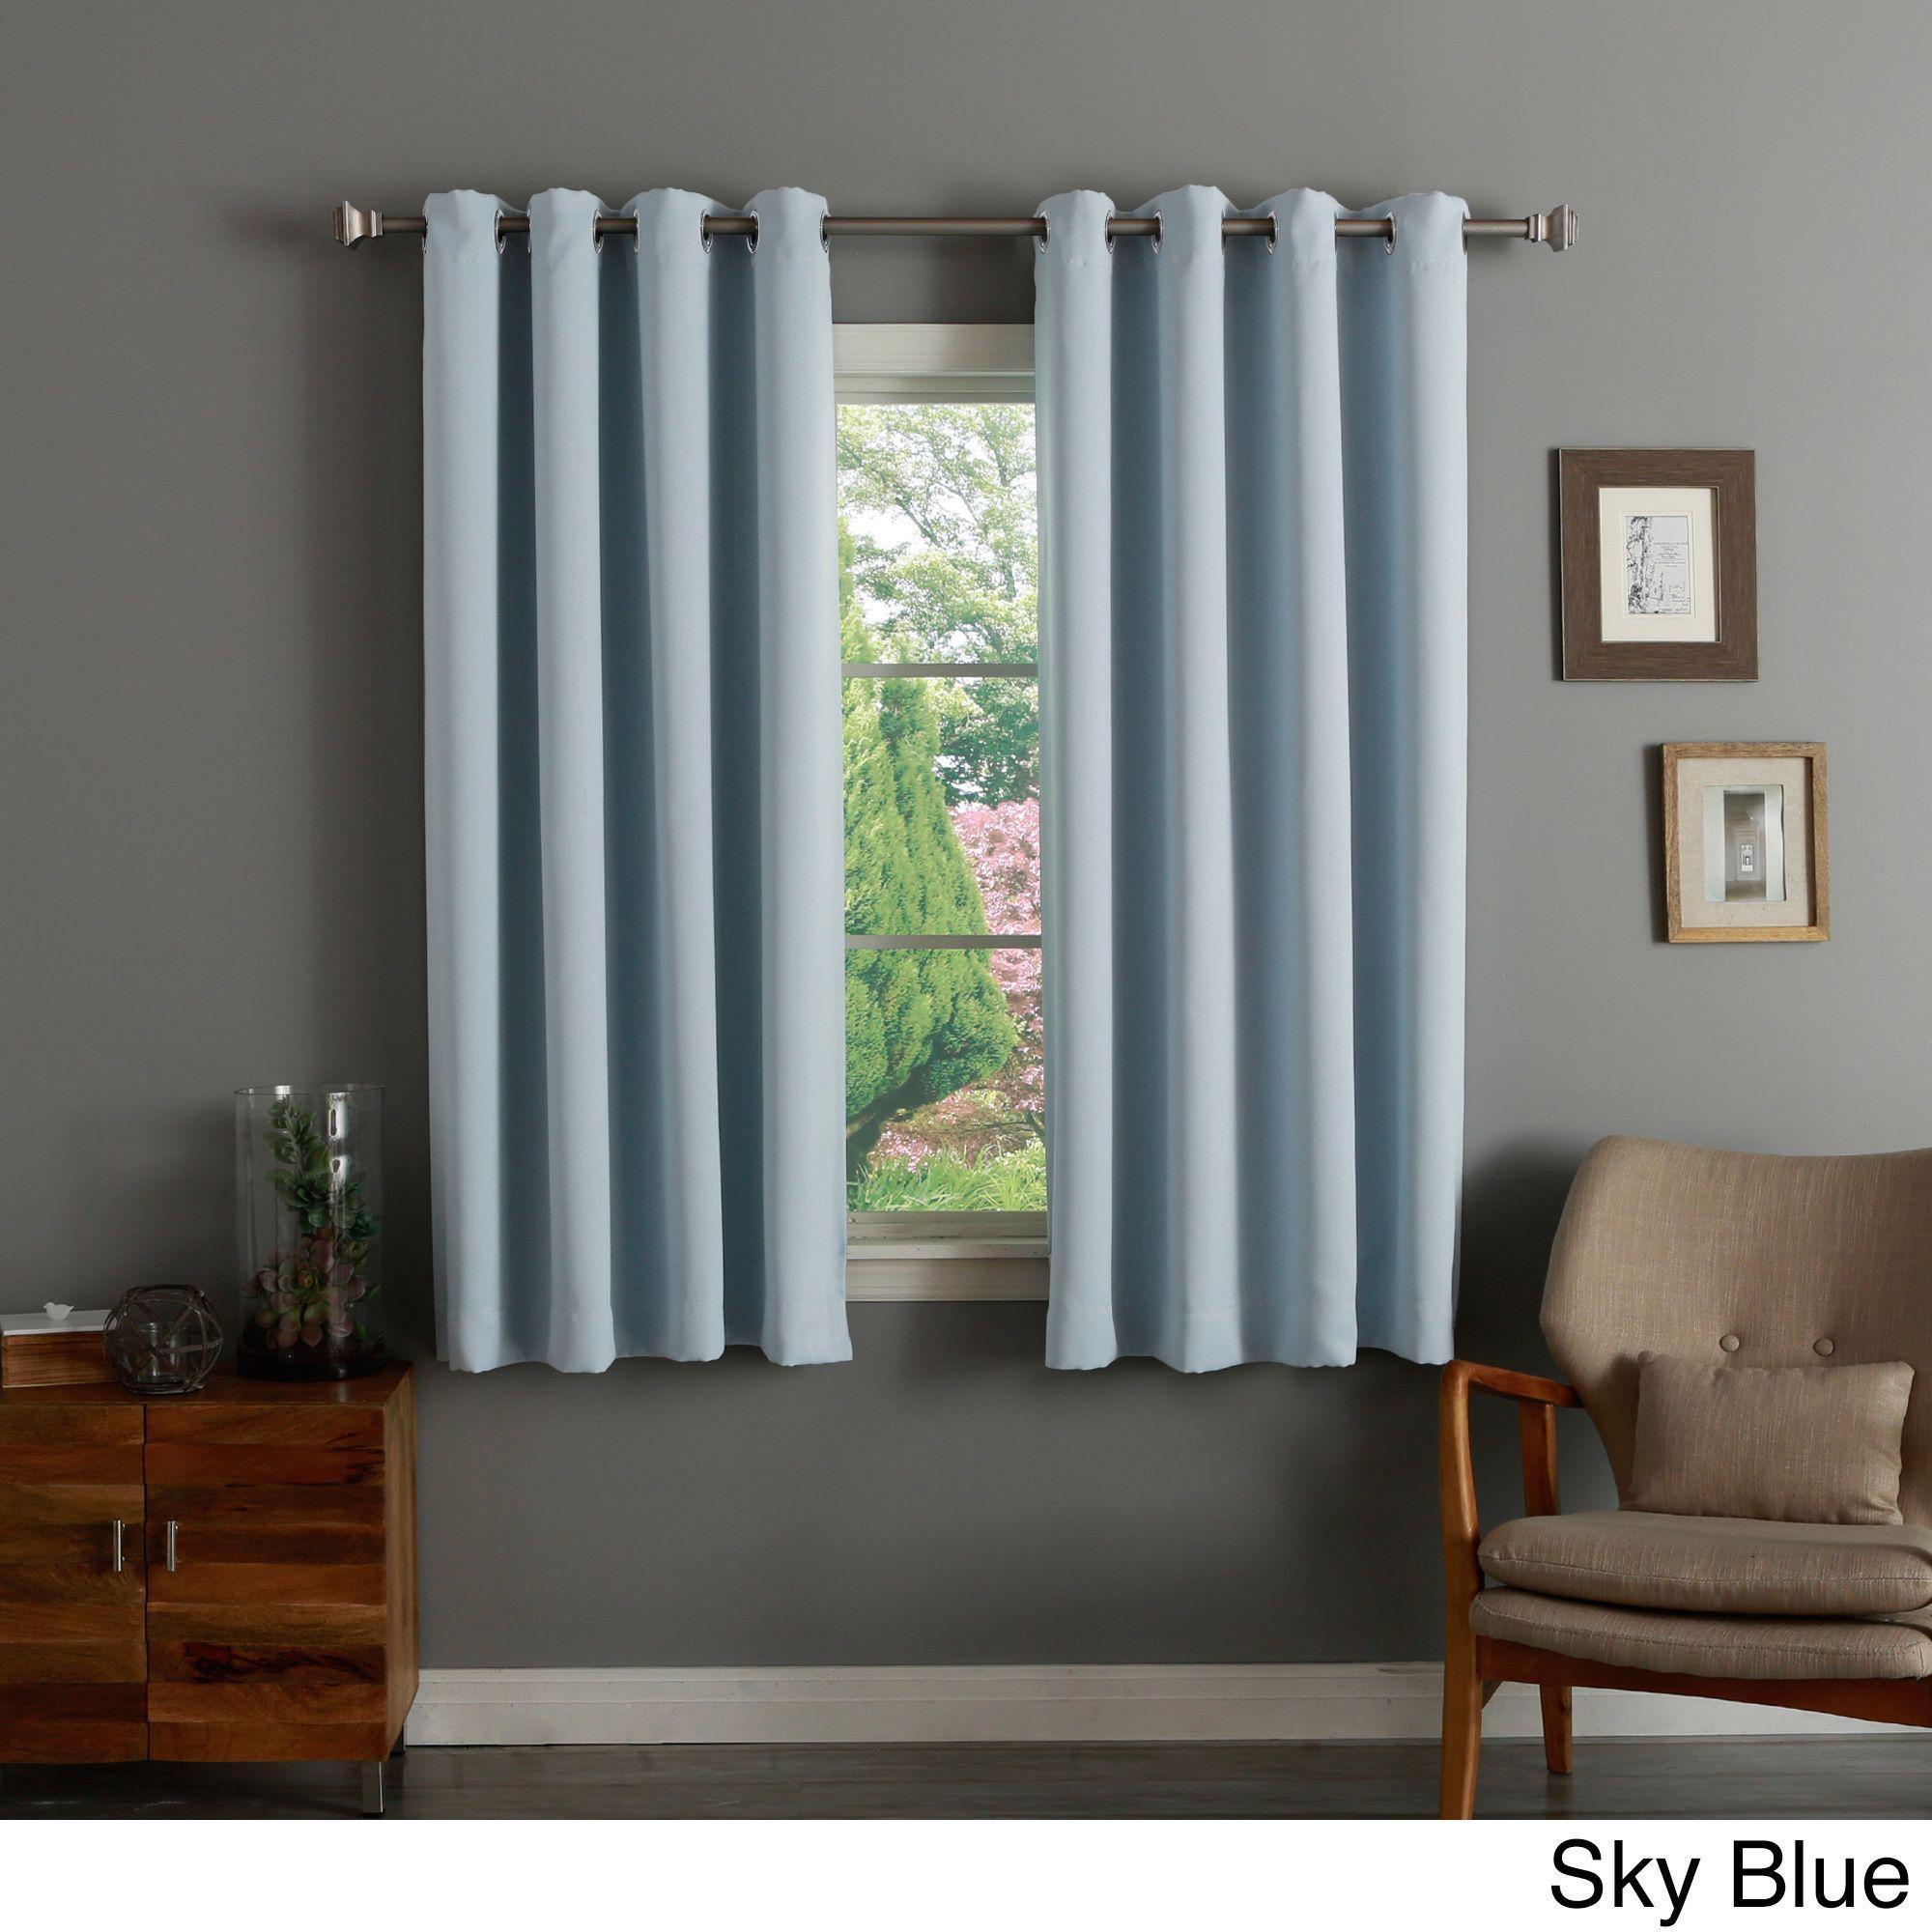 2 Panel Polyester Window Curtain 35 X 63 Inch Window Blinds Modern